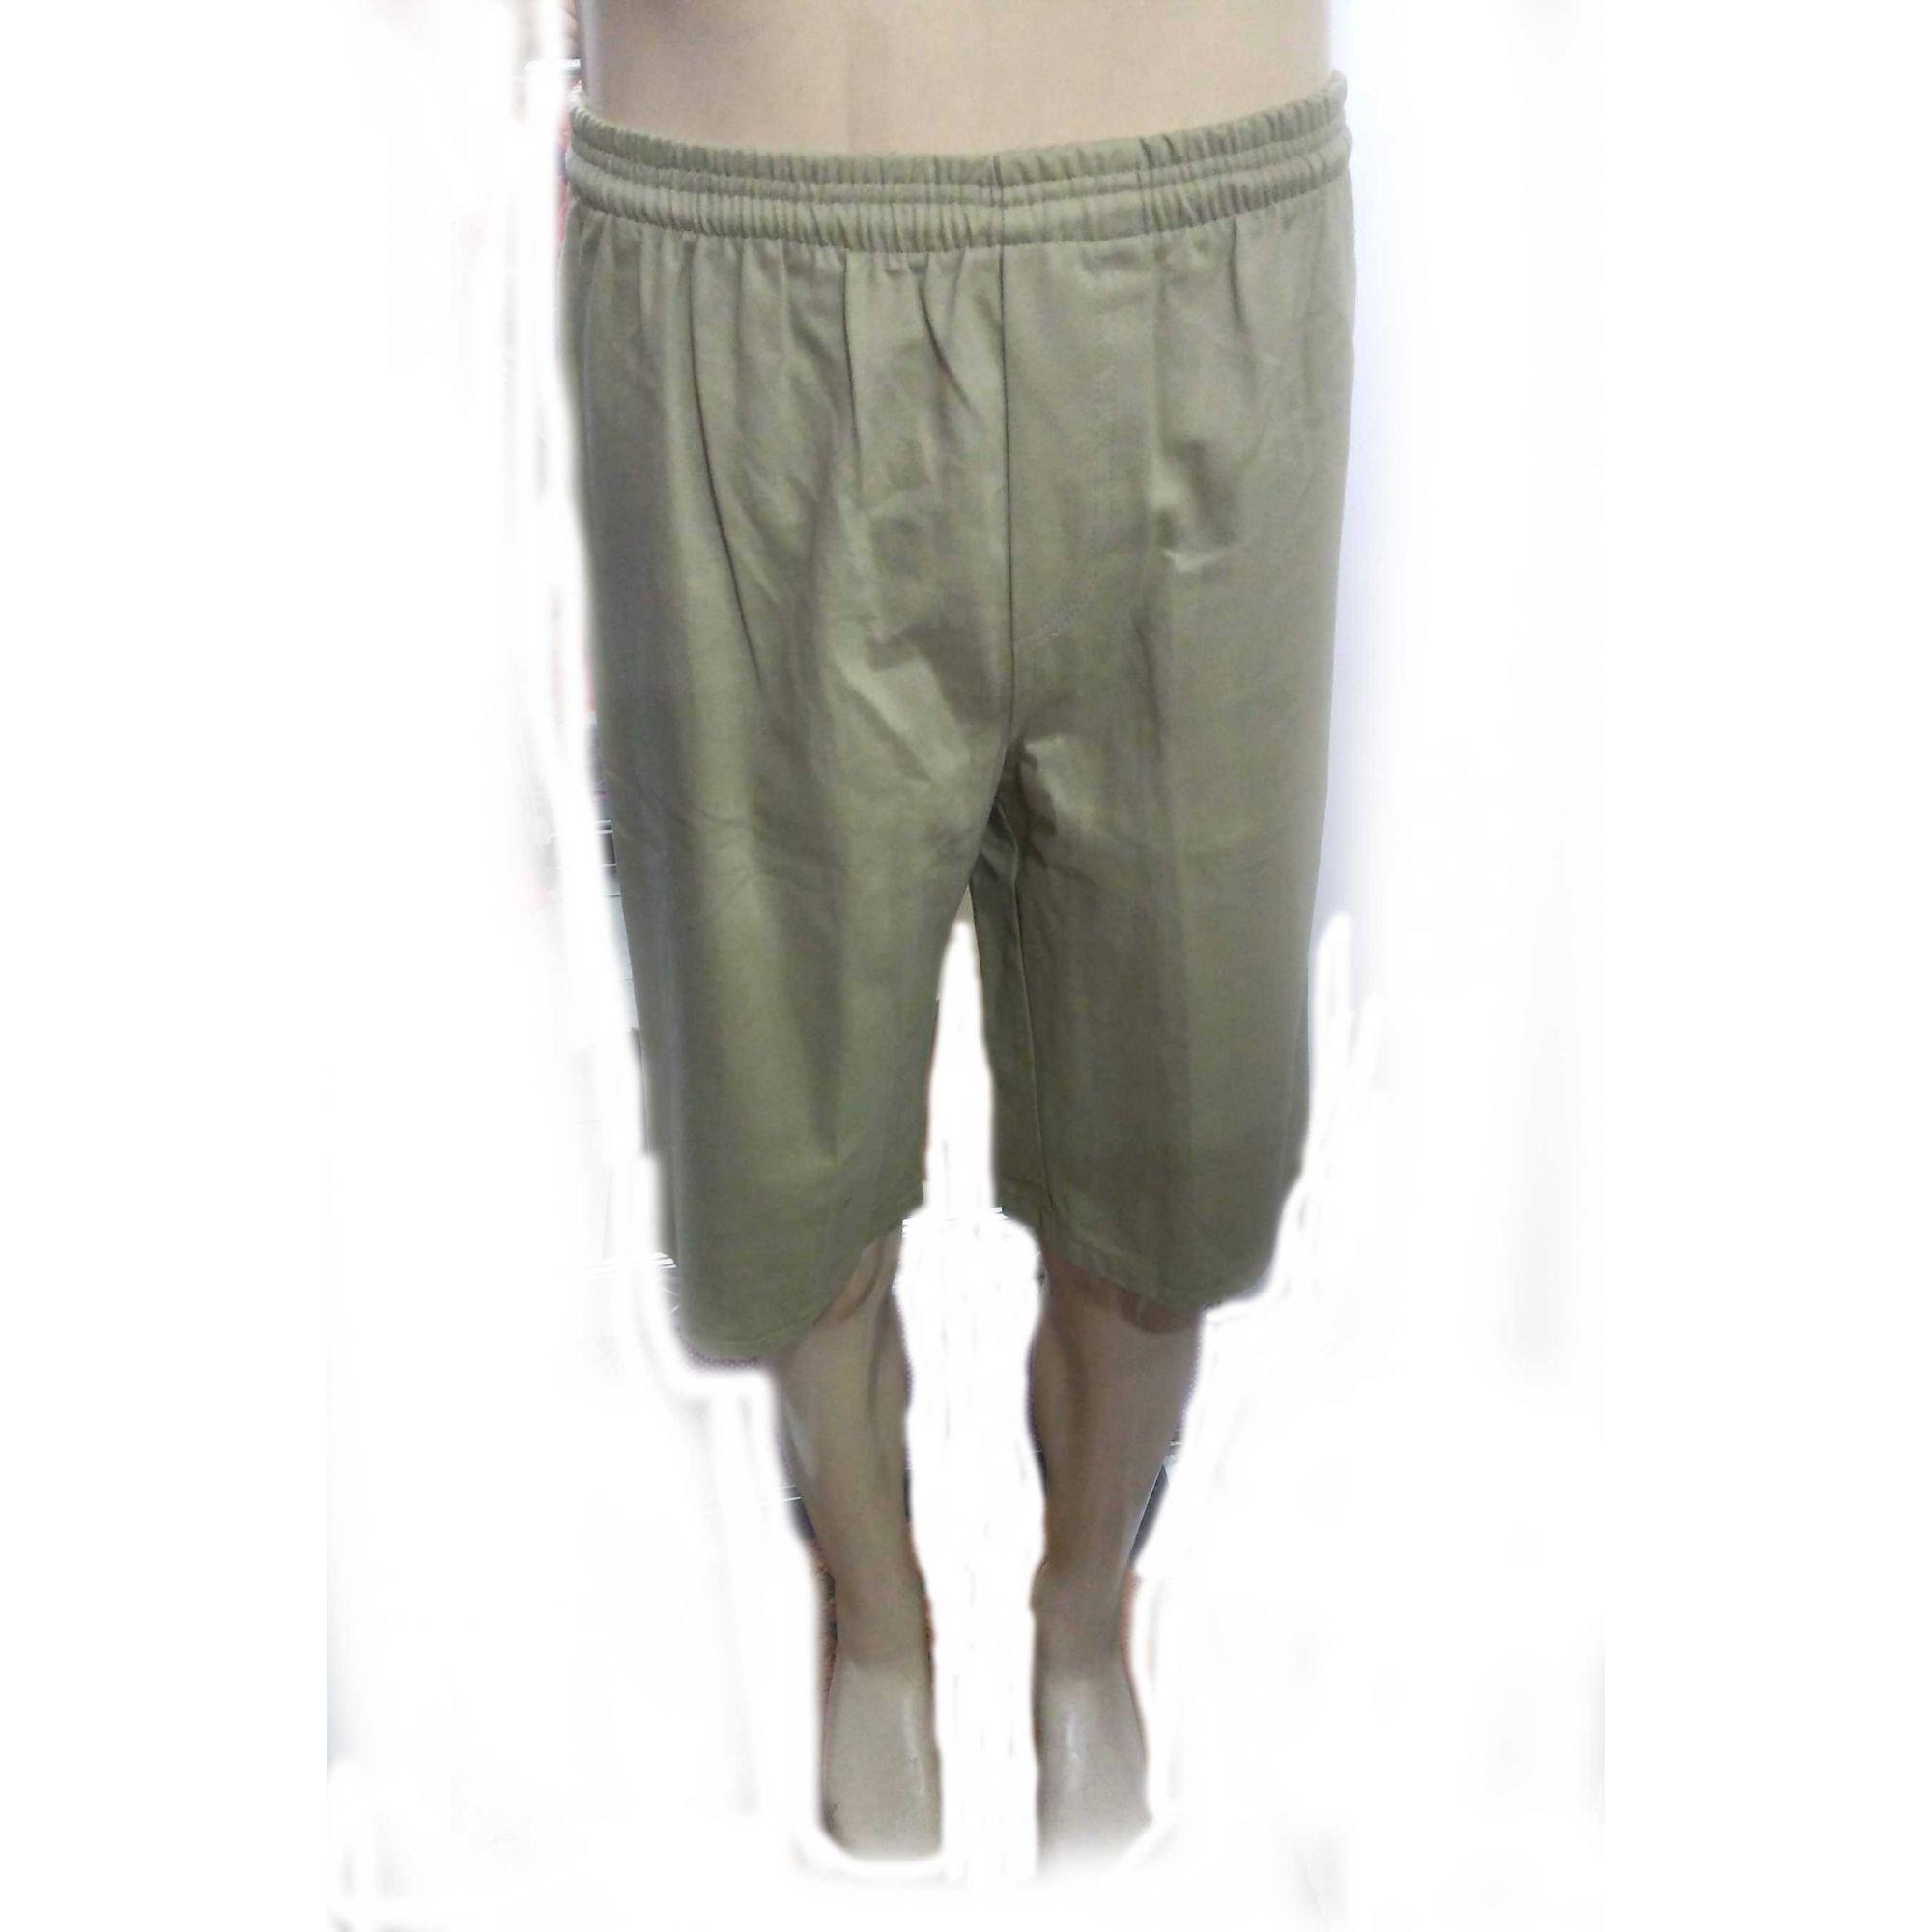 Bermuda Sarja Masculina shorts Cdps Uniformes caqui